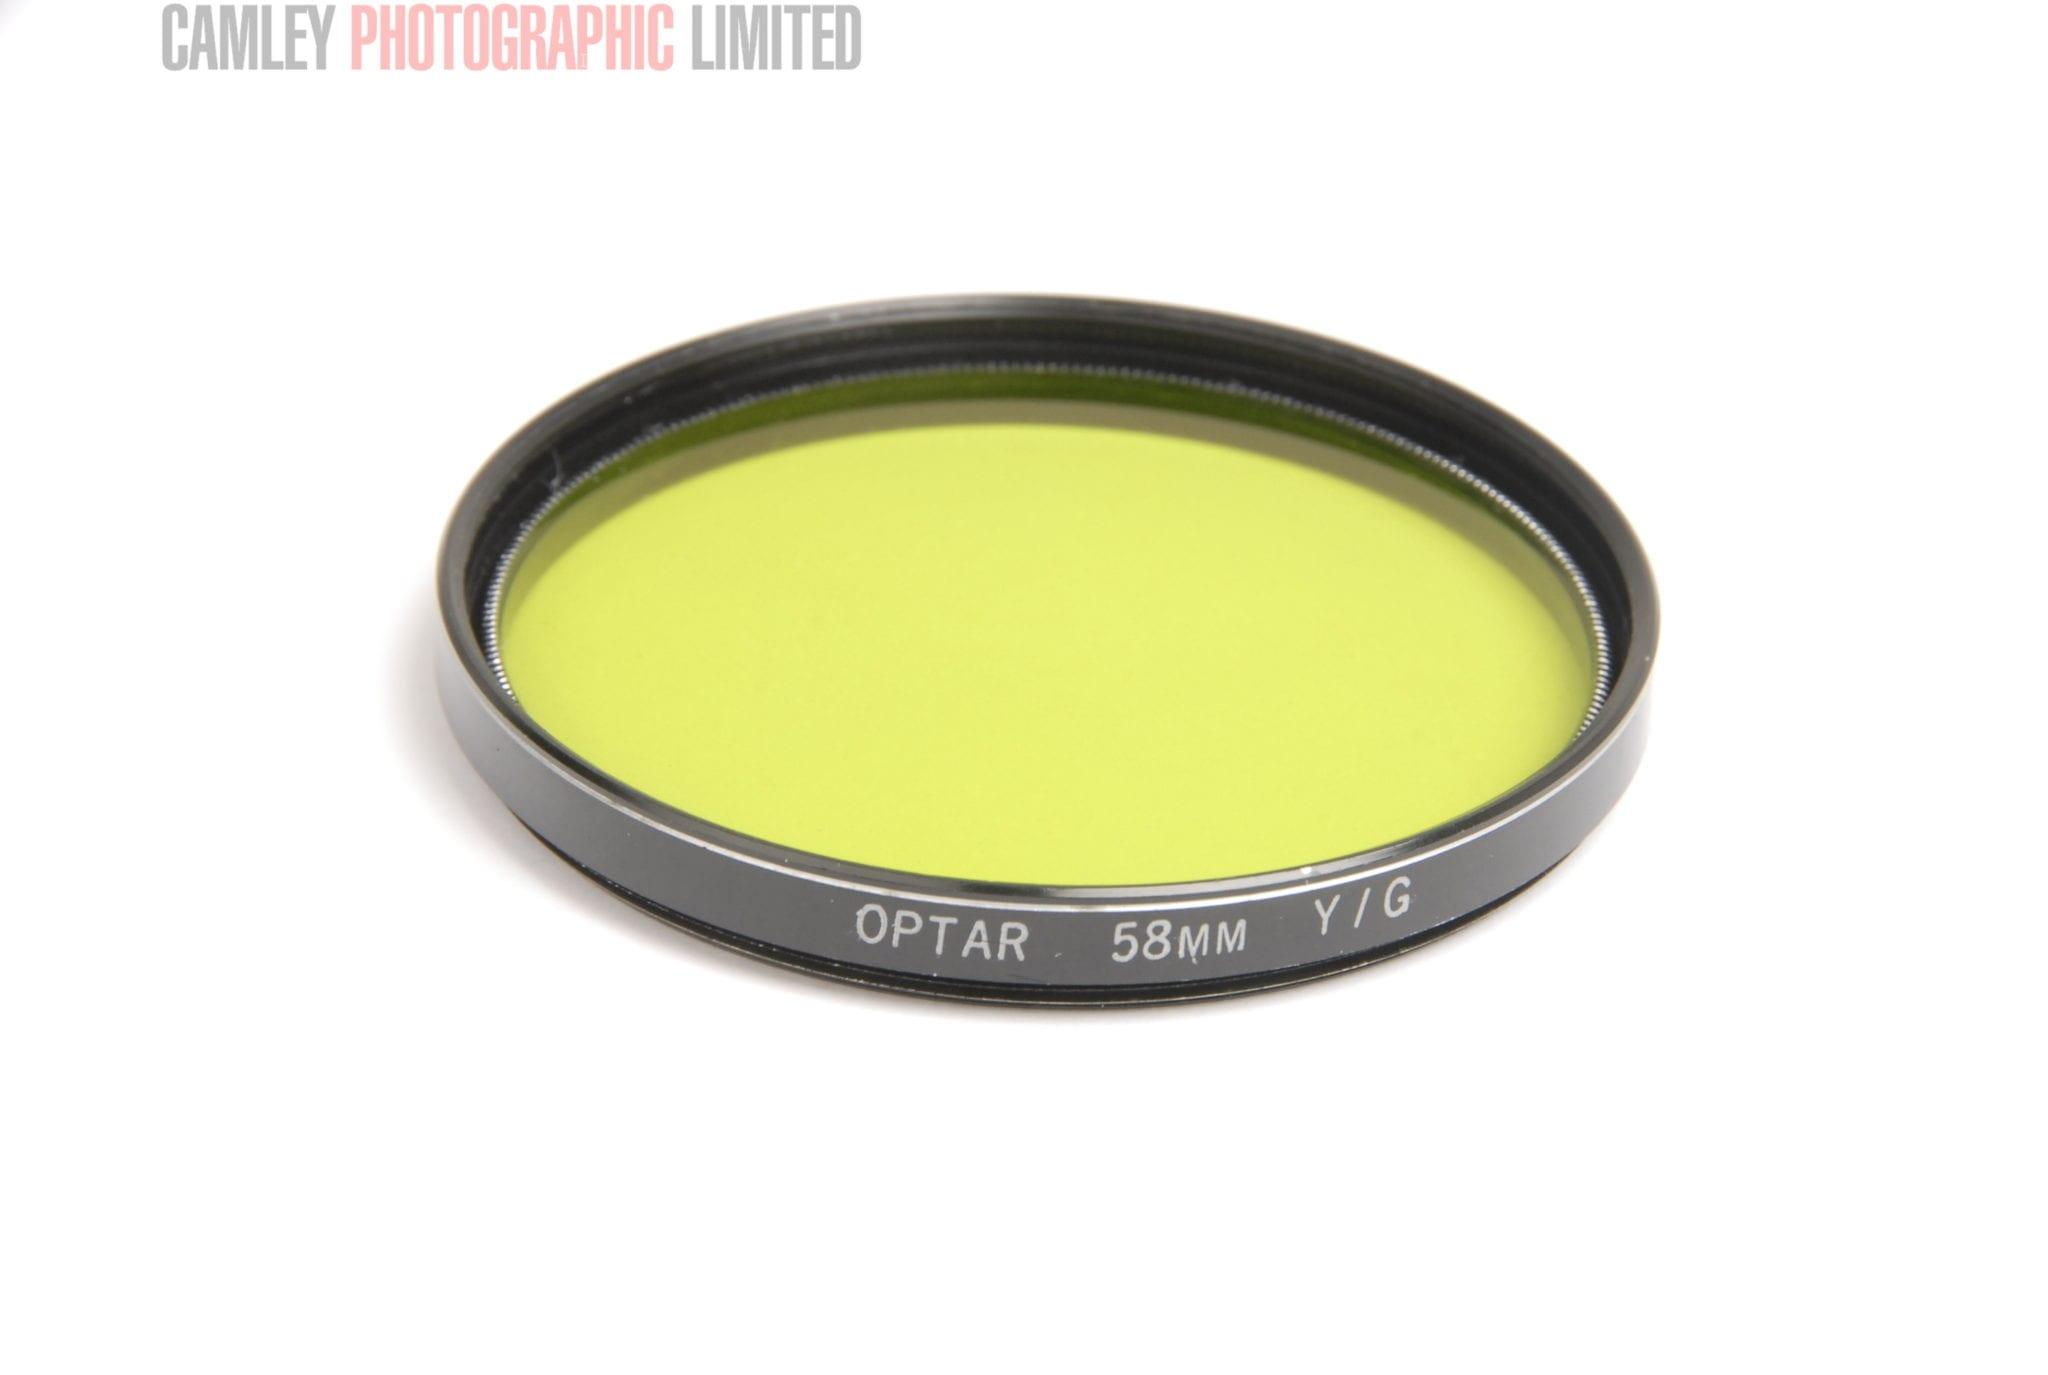 Optar 58mm yellow green filter condition 4e 7963